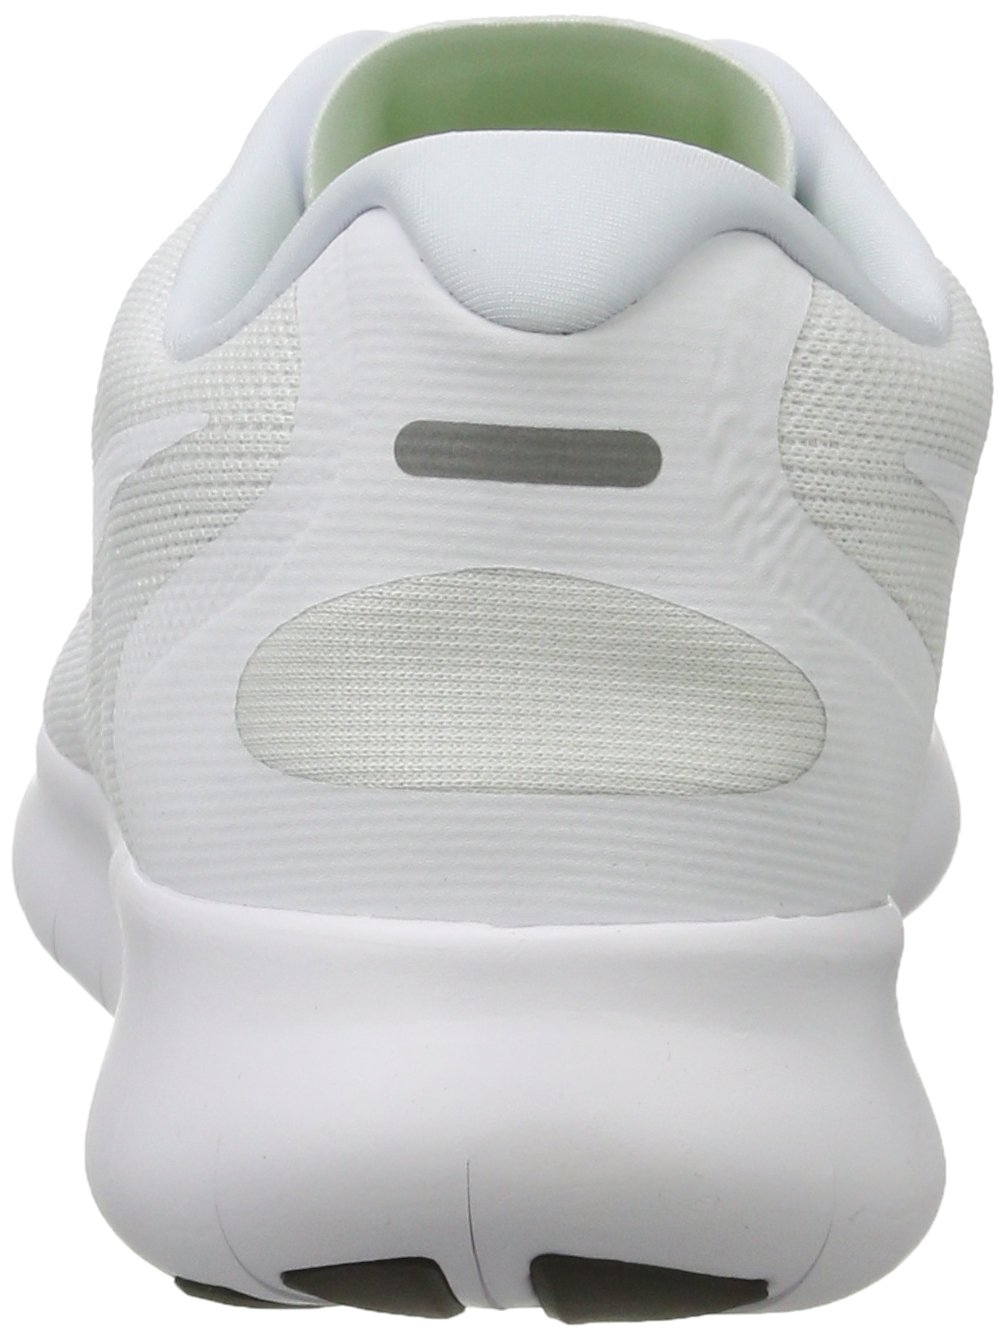 NIKE Men's Free RN D(M) Running Shoe B00UVH5BB0 12.5 D(M) RN US White/Black/Pure Platinum 328b54